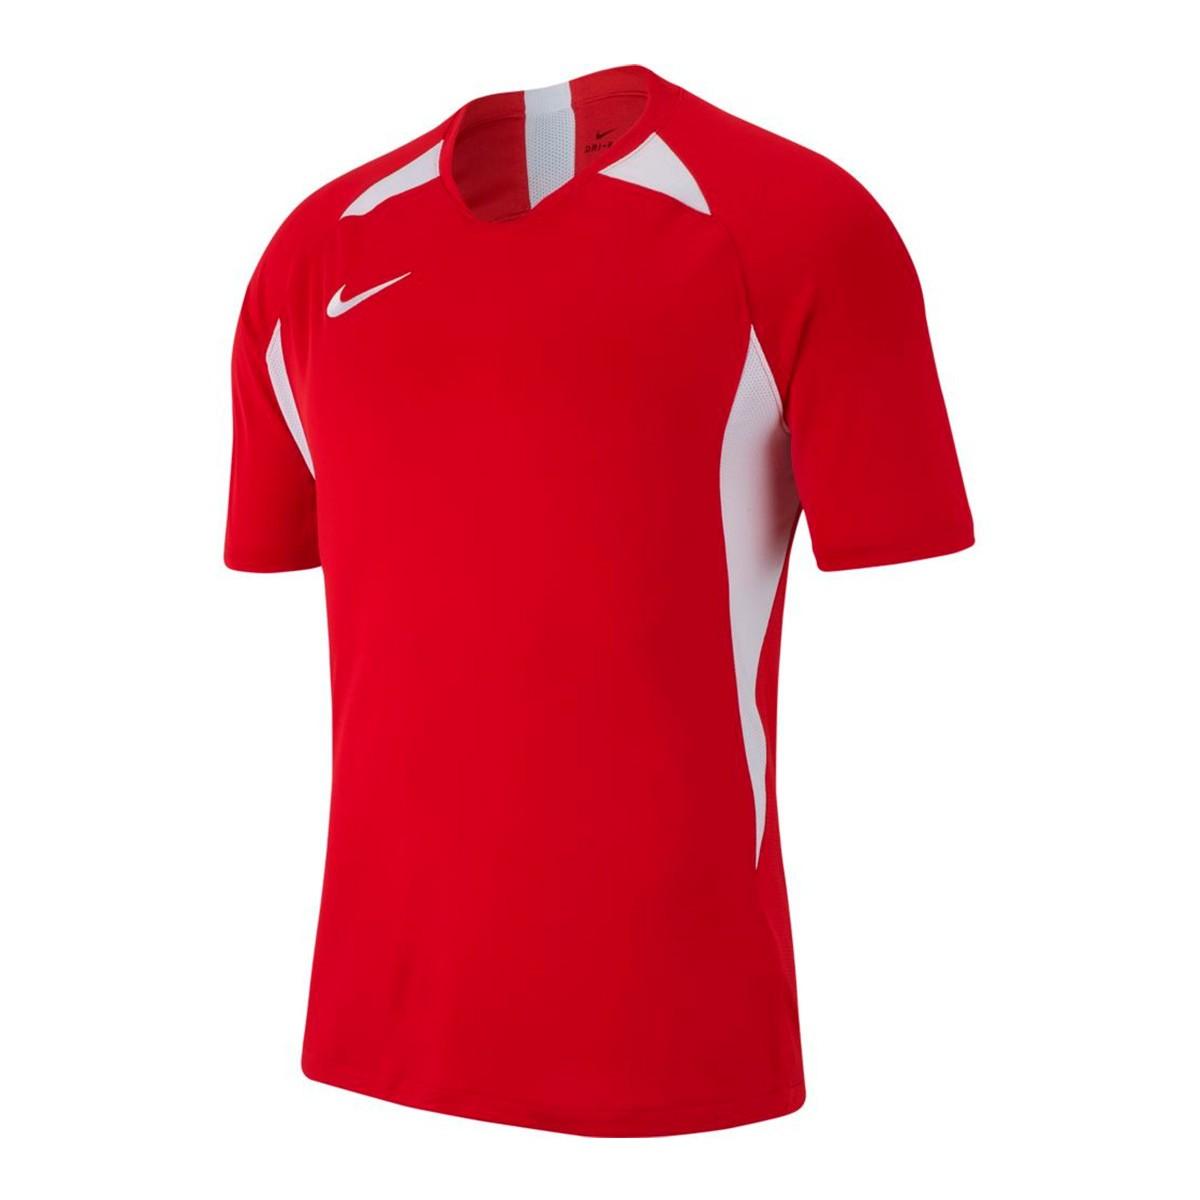 804feda4 Jersey Nike Kids Legend m/c University red-White - Tienda de fútbol ...